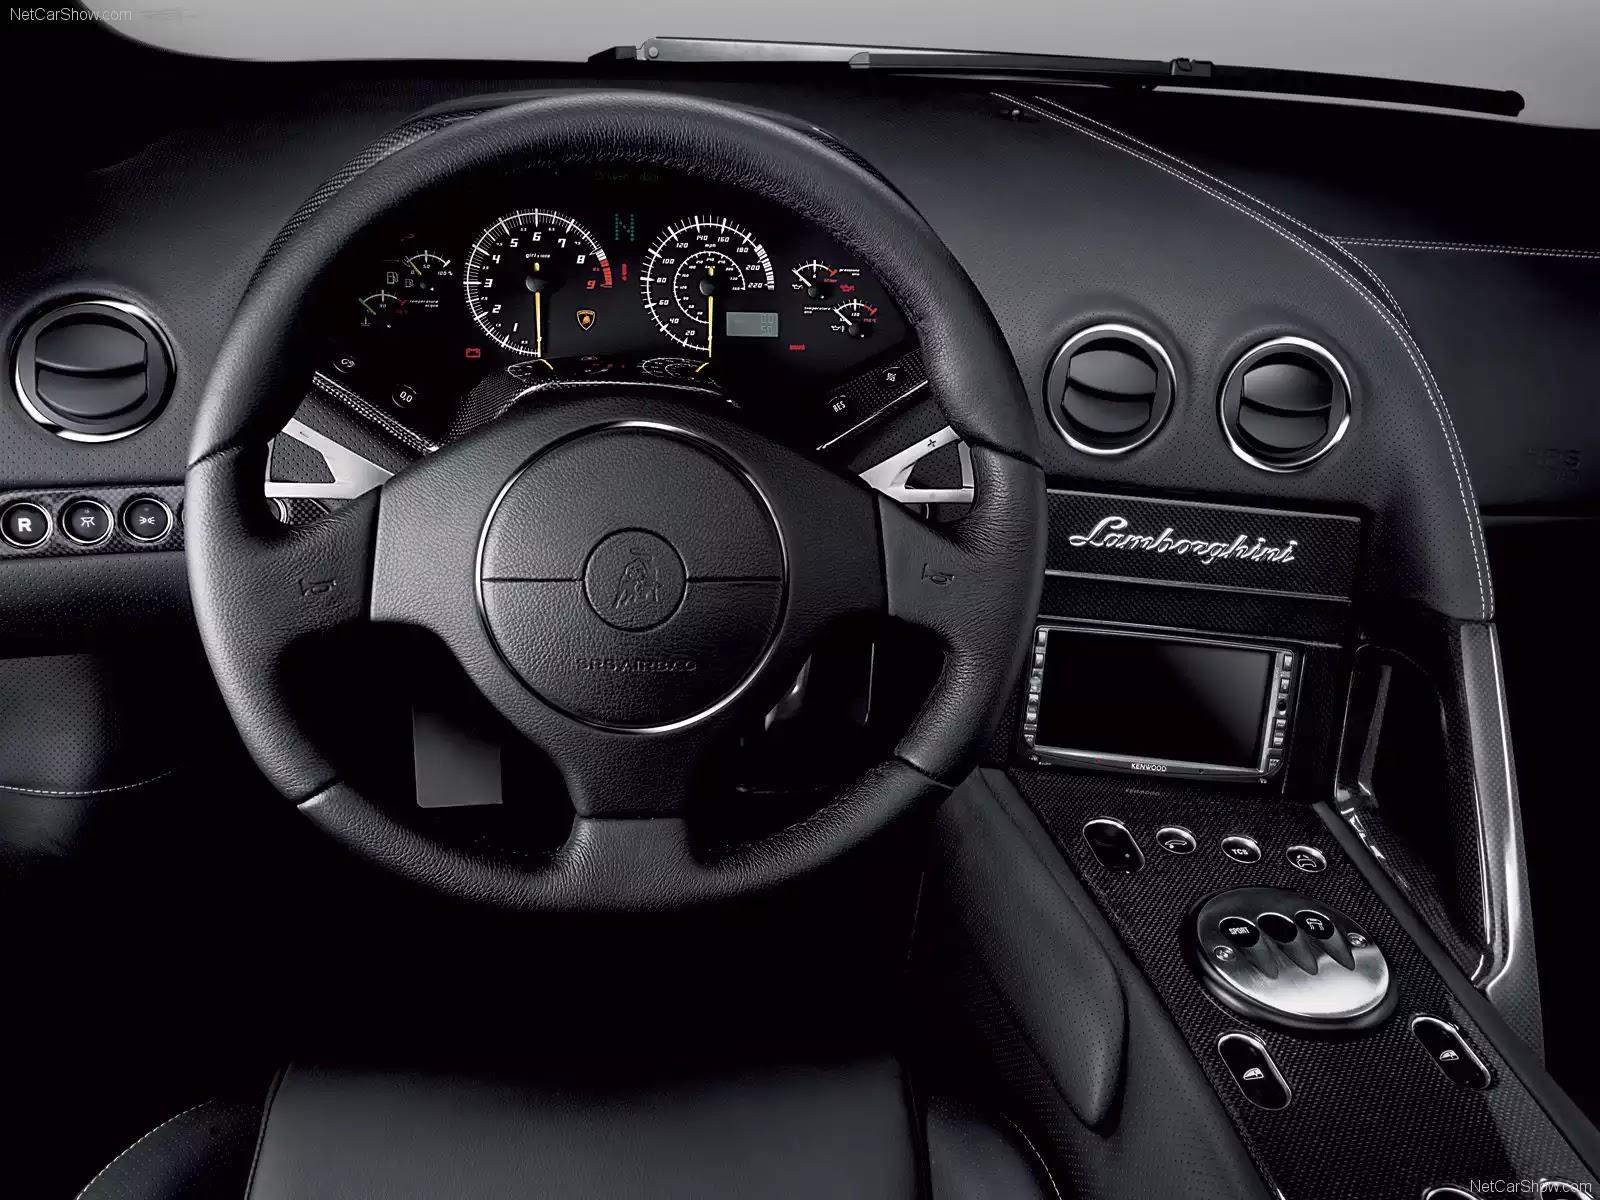 Hình ảnh siêu xe Lamborghini Murcielago LP640 Roadster 2007 & nội ngoại thất